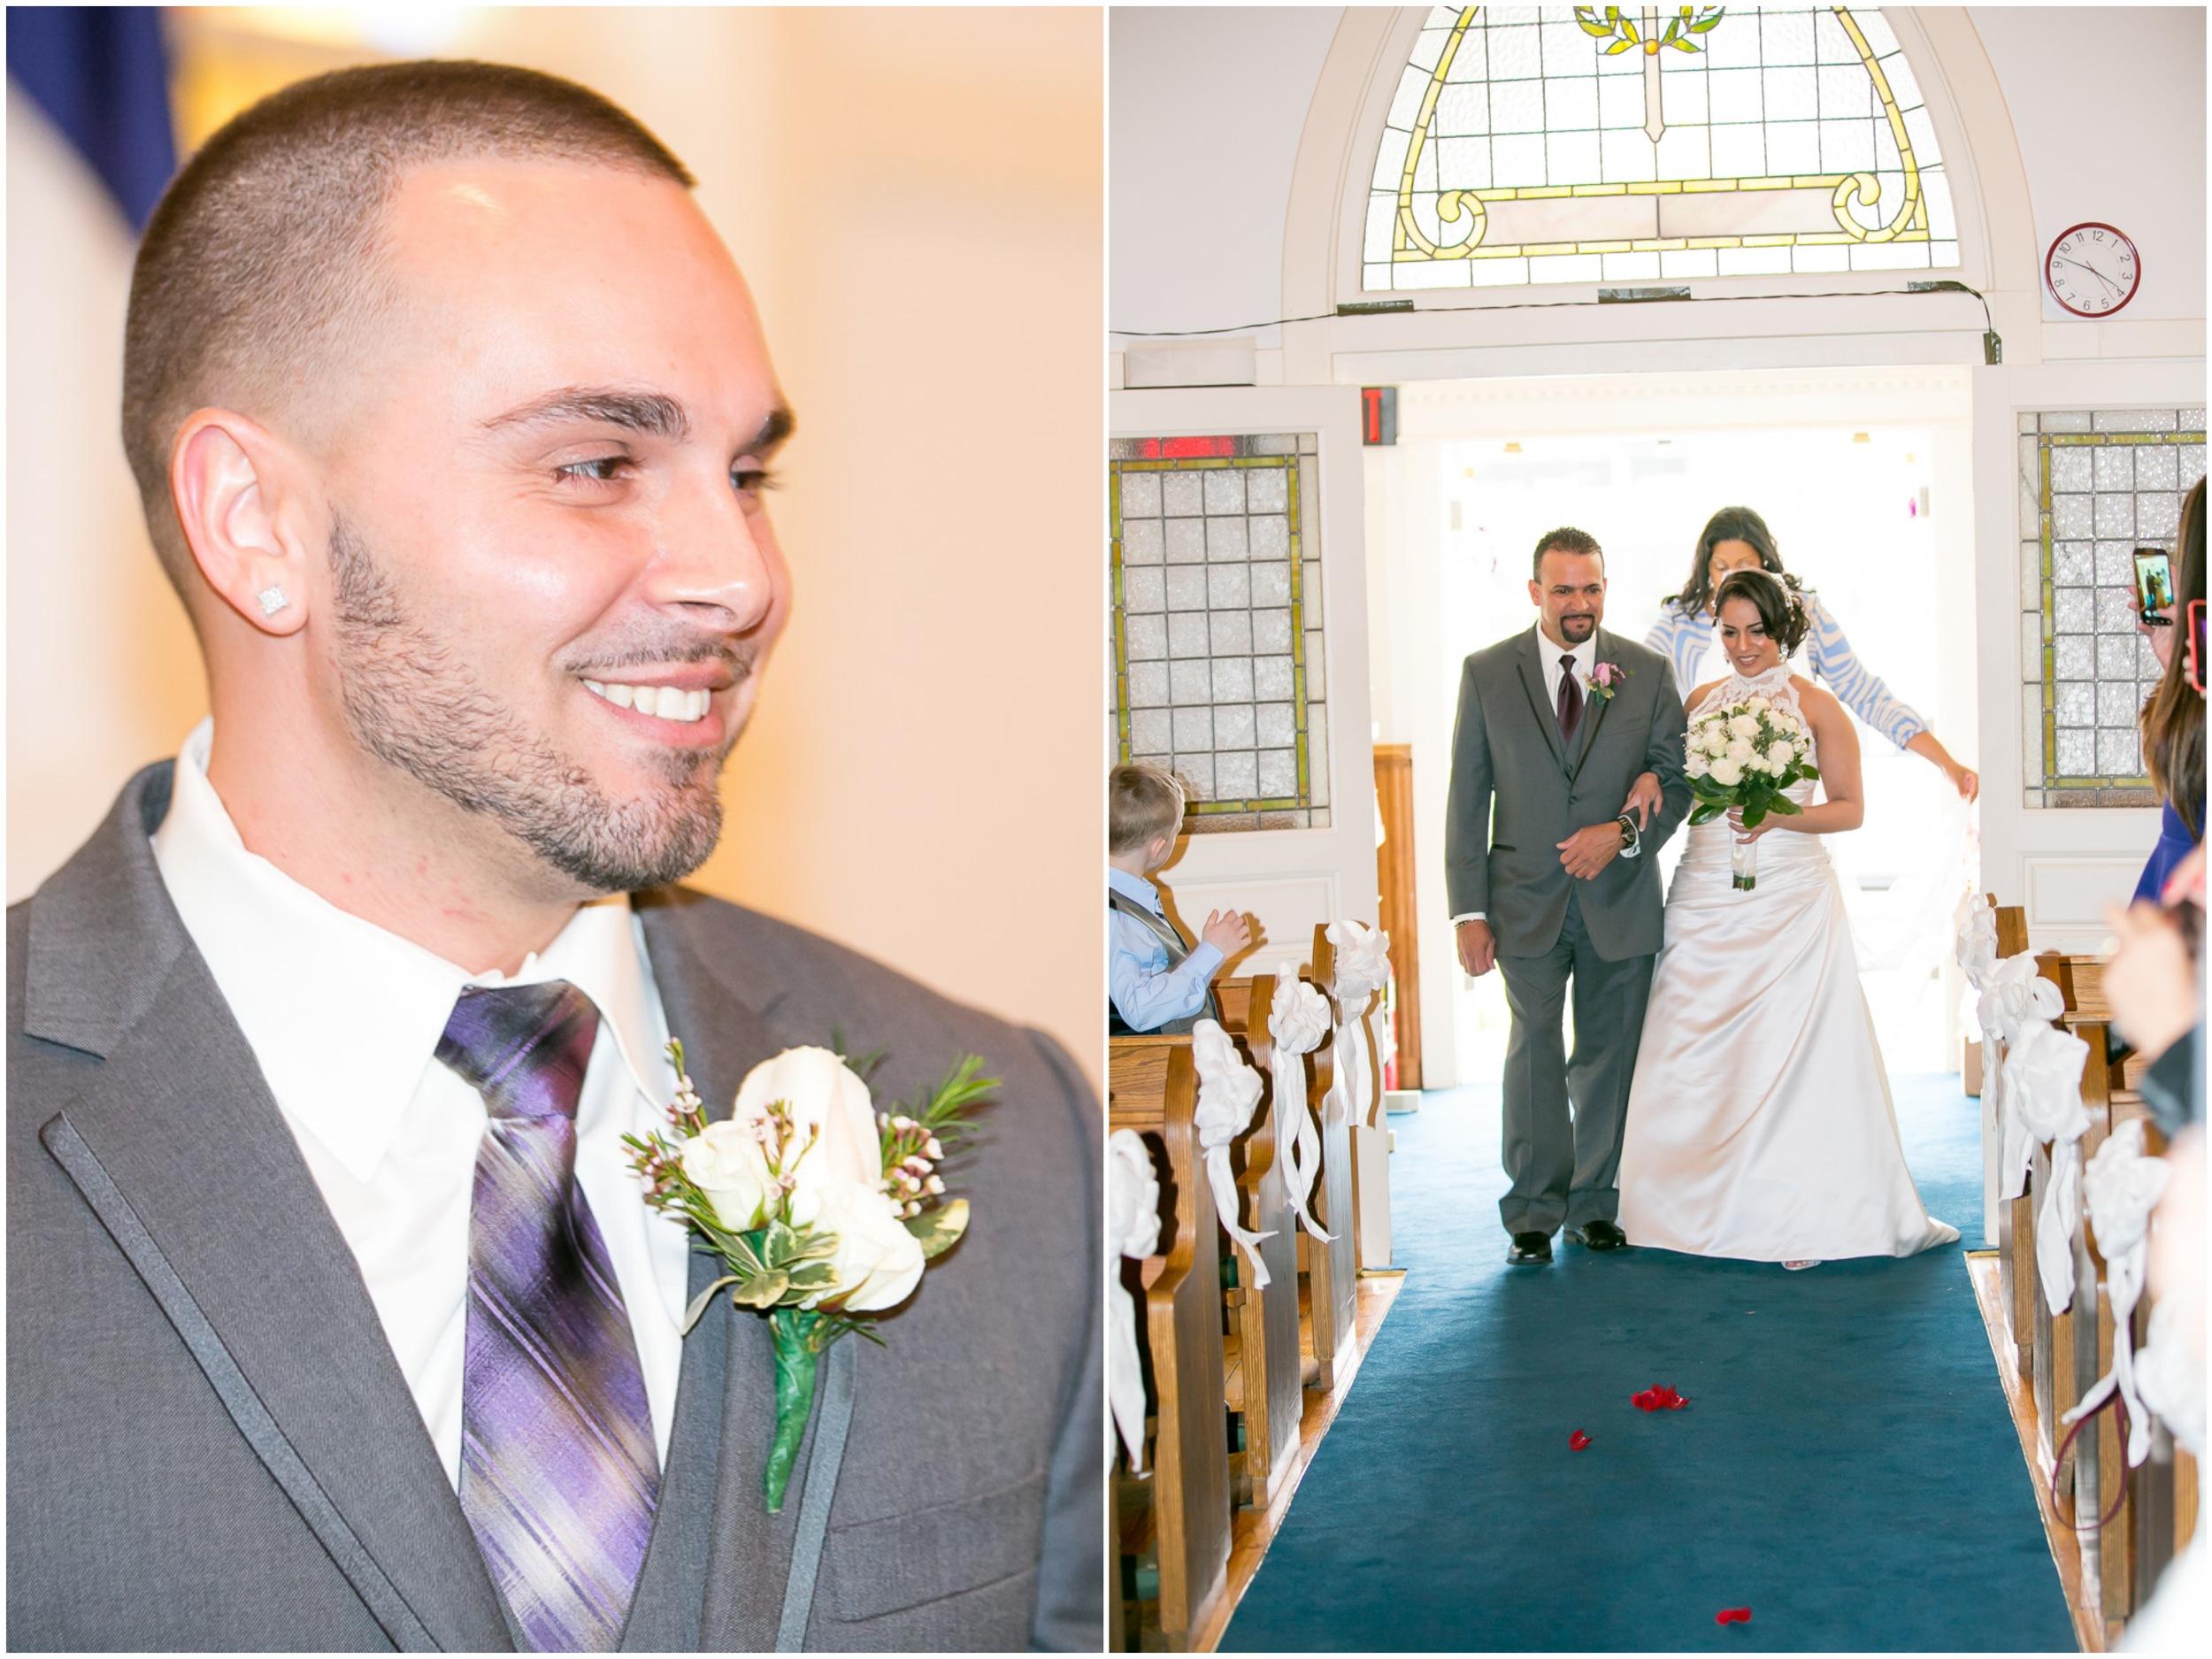 Bradly-and-Jesenia-Wedding-Collage-13.jpg